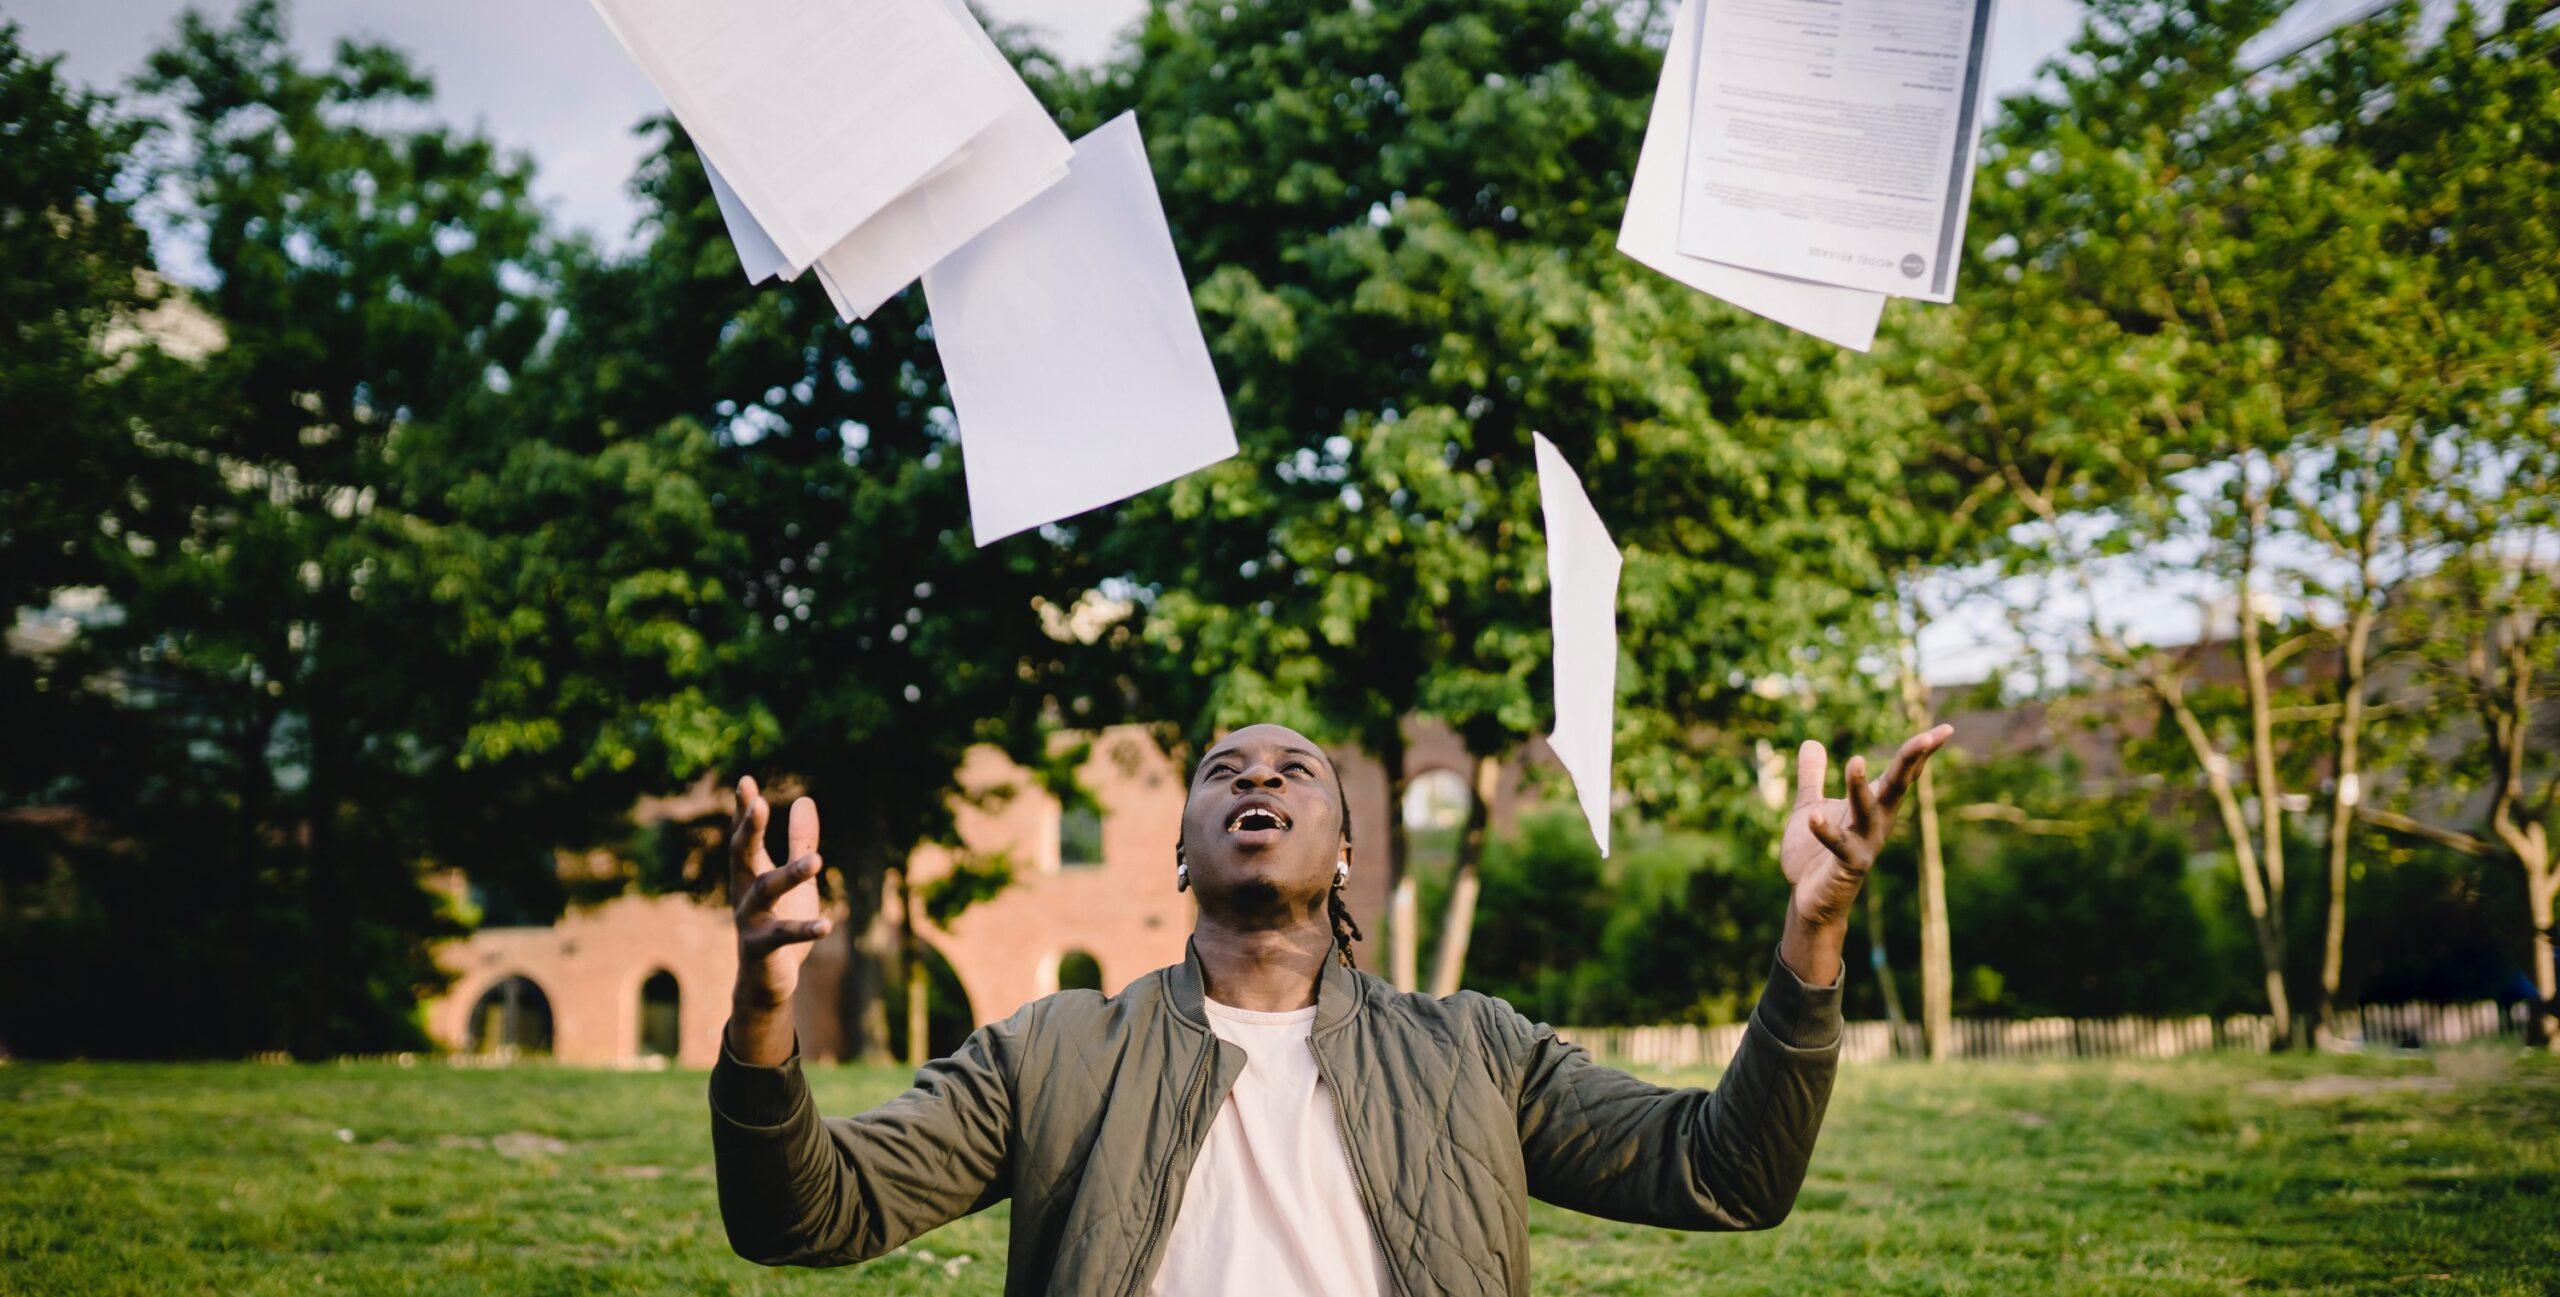 Jovem a lançar papéis ao ar